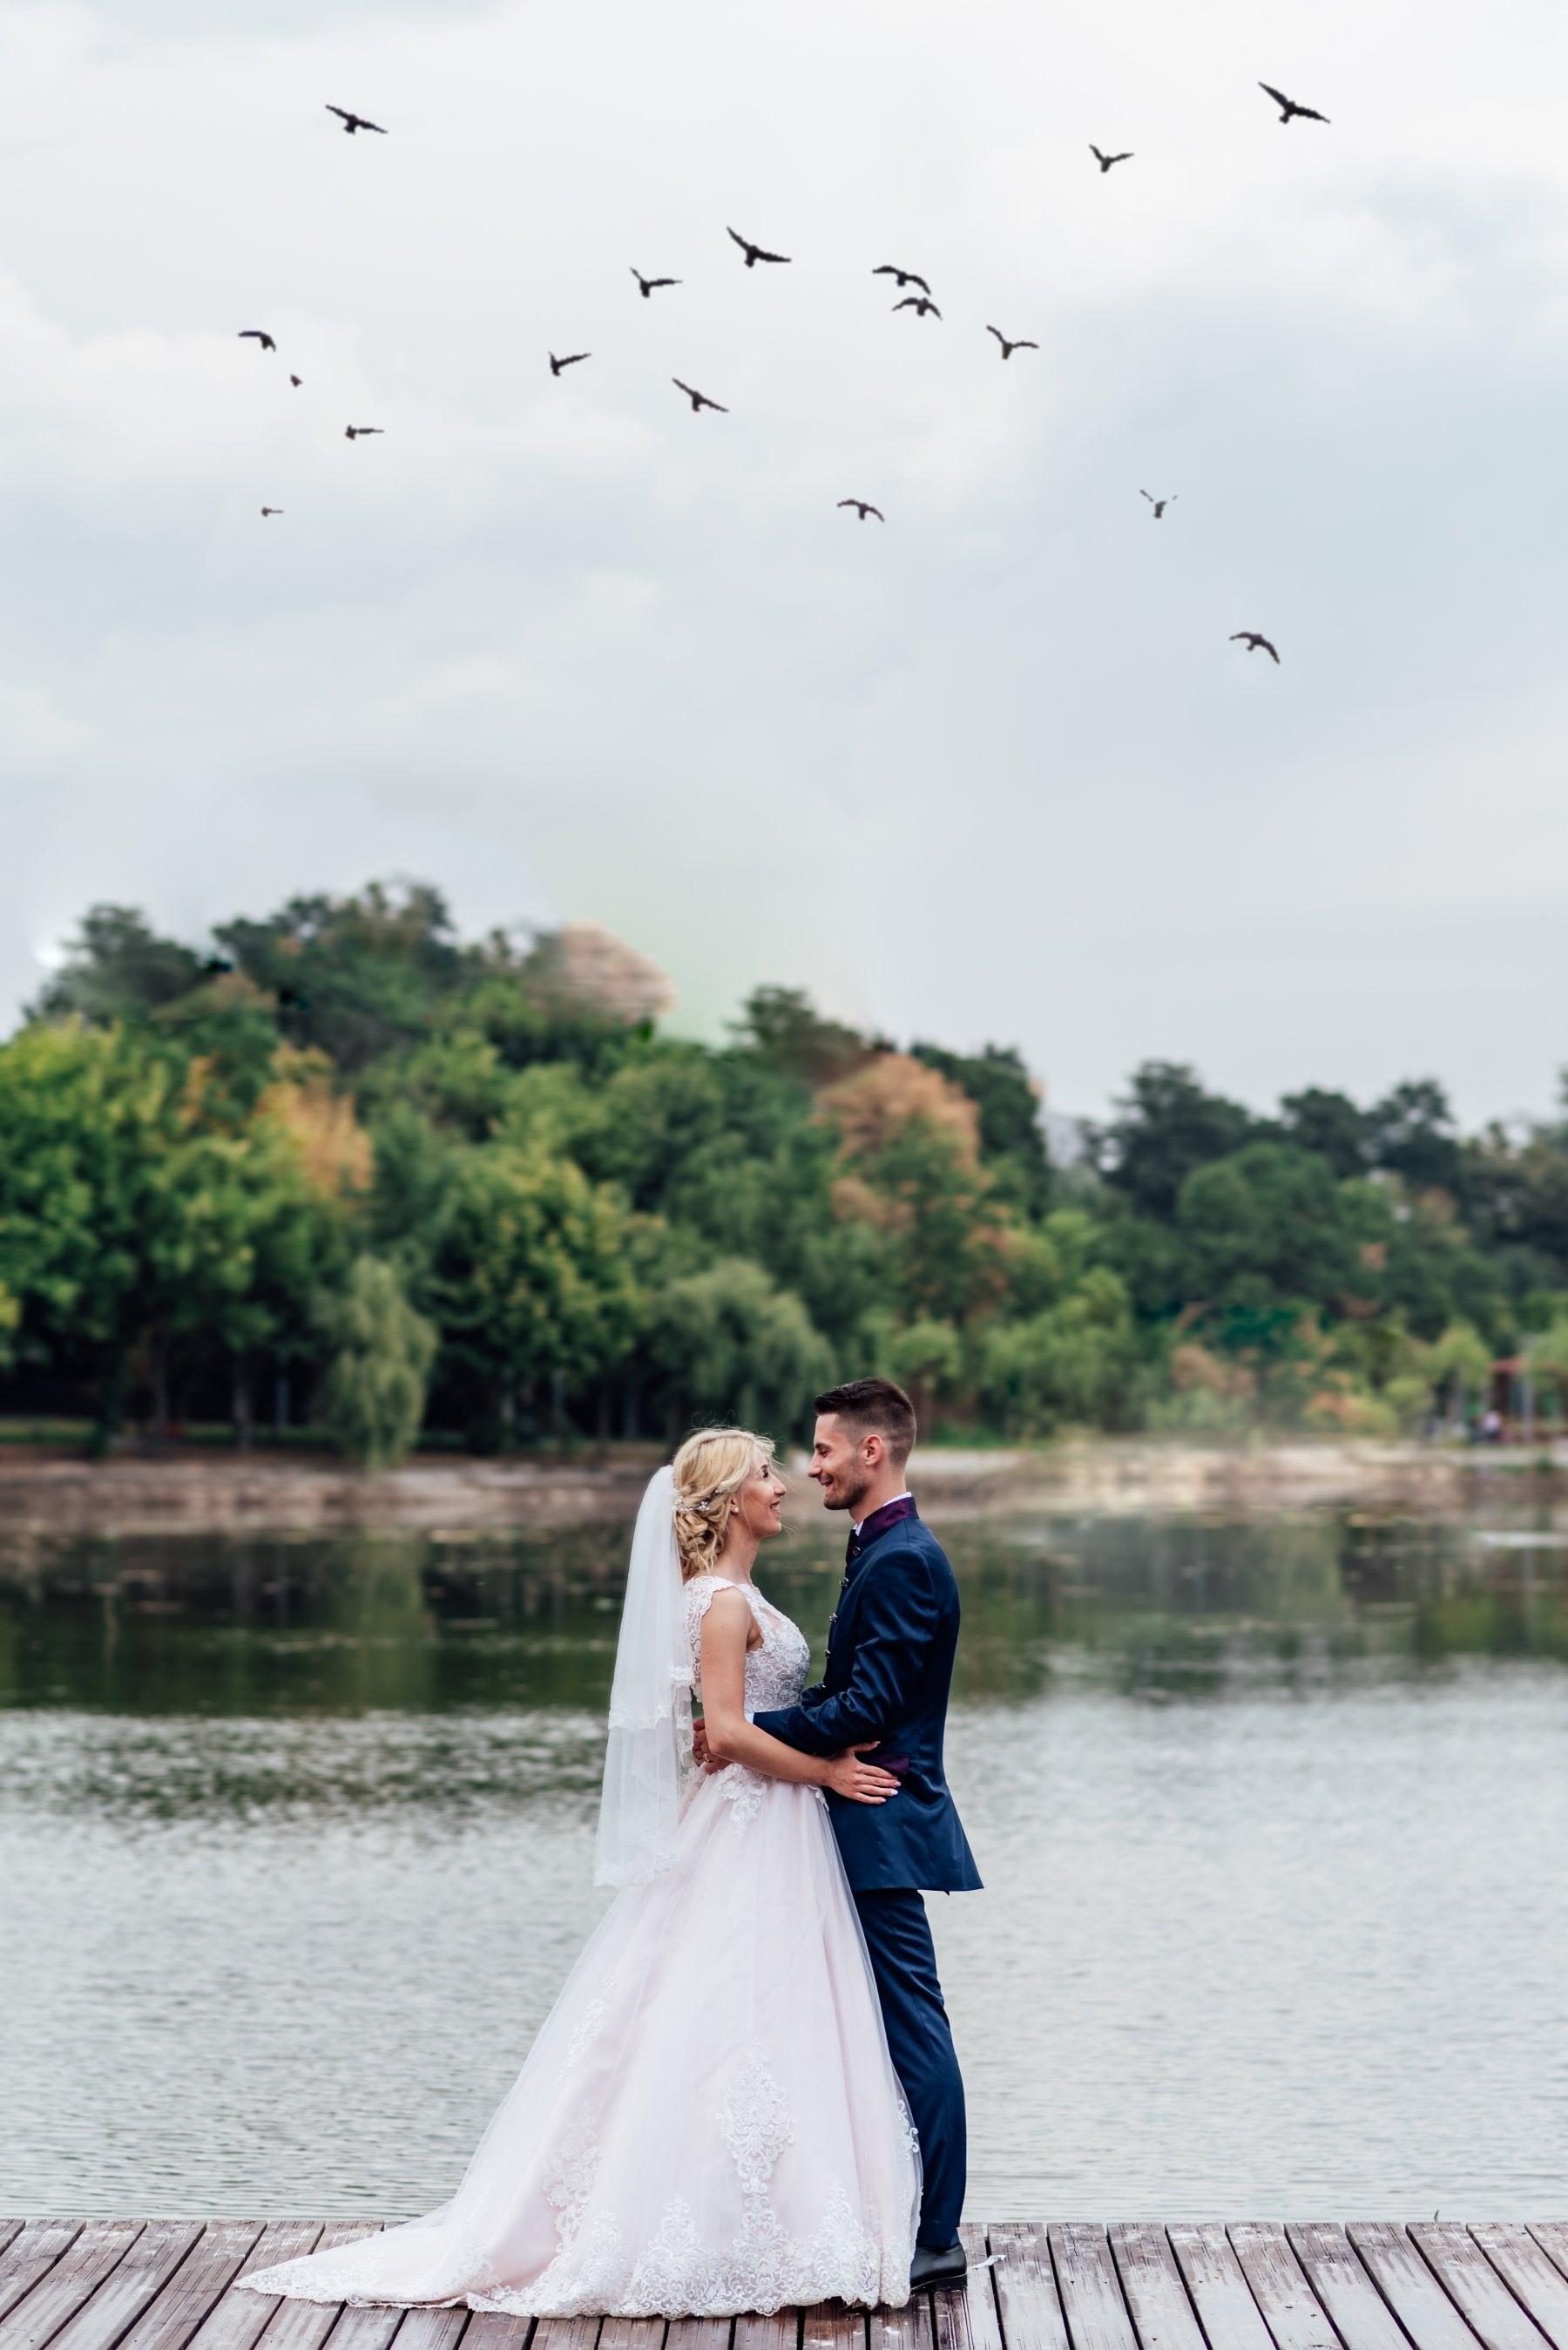 500+ Amazing Wedding Photos · Pexels · Free Stock Photos